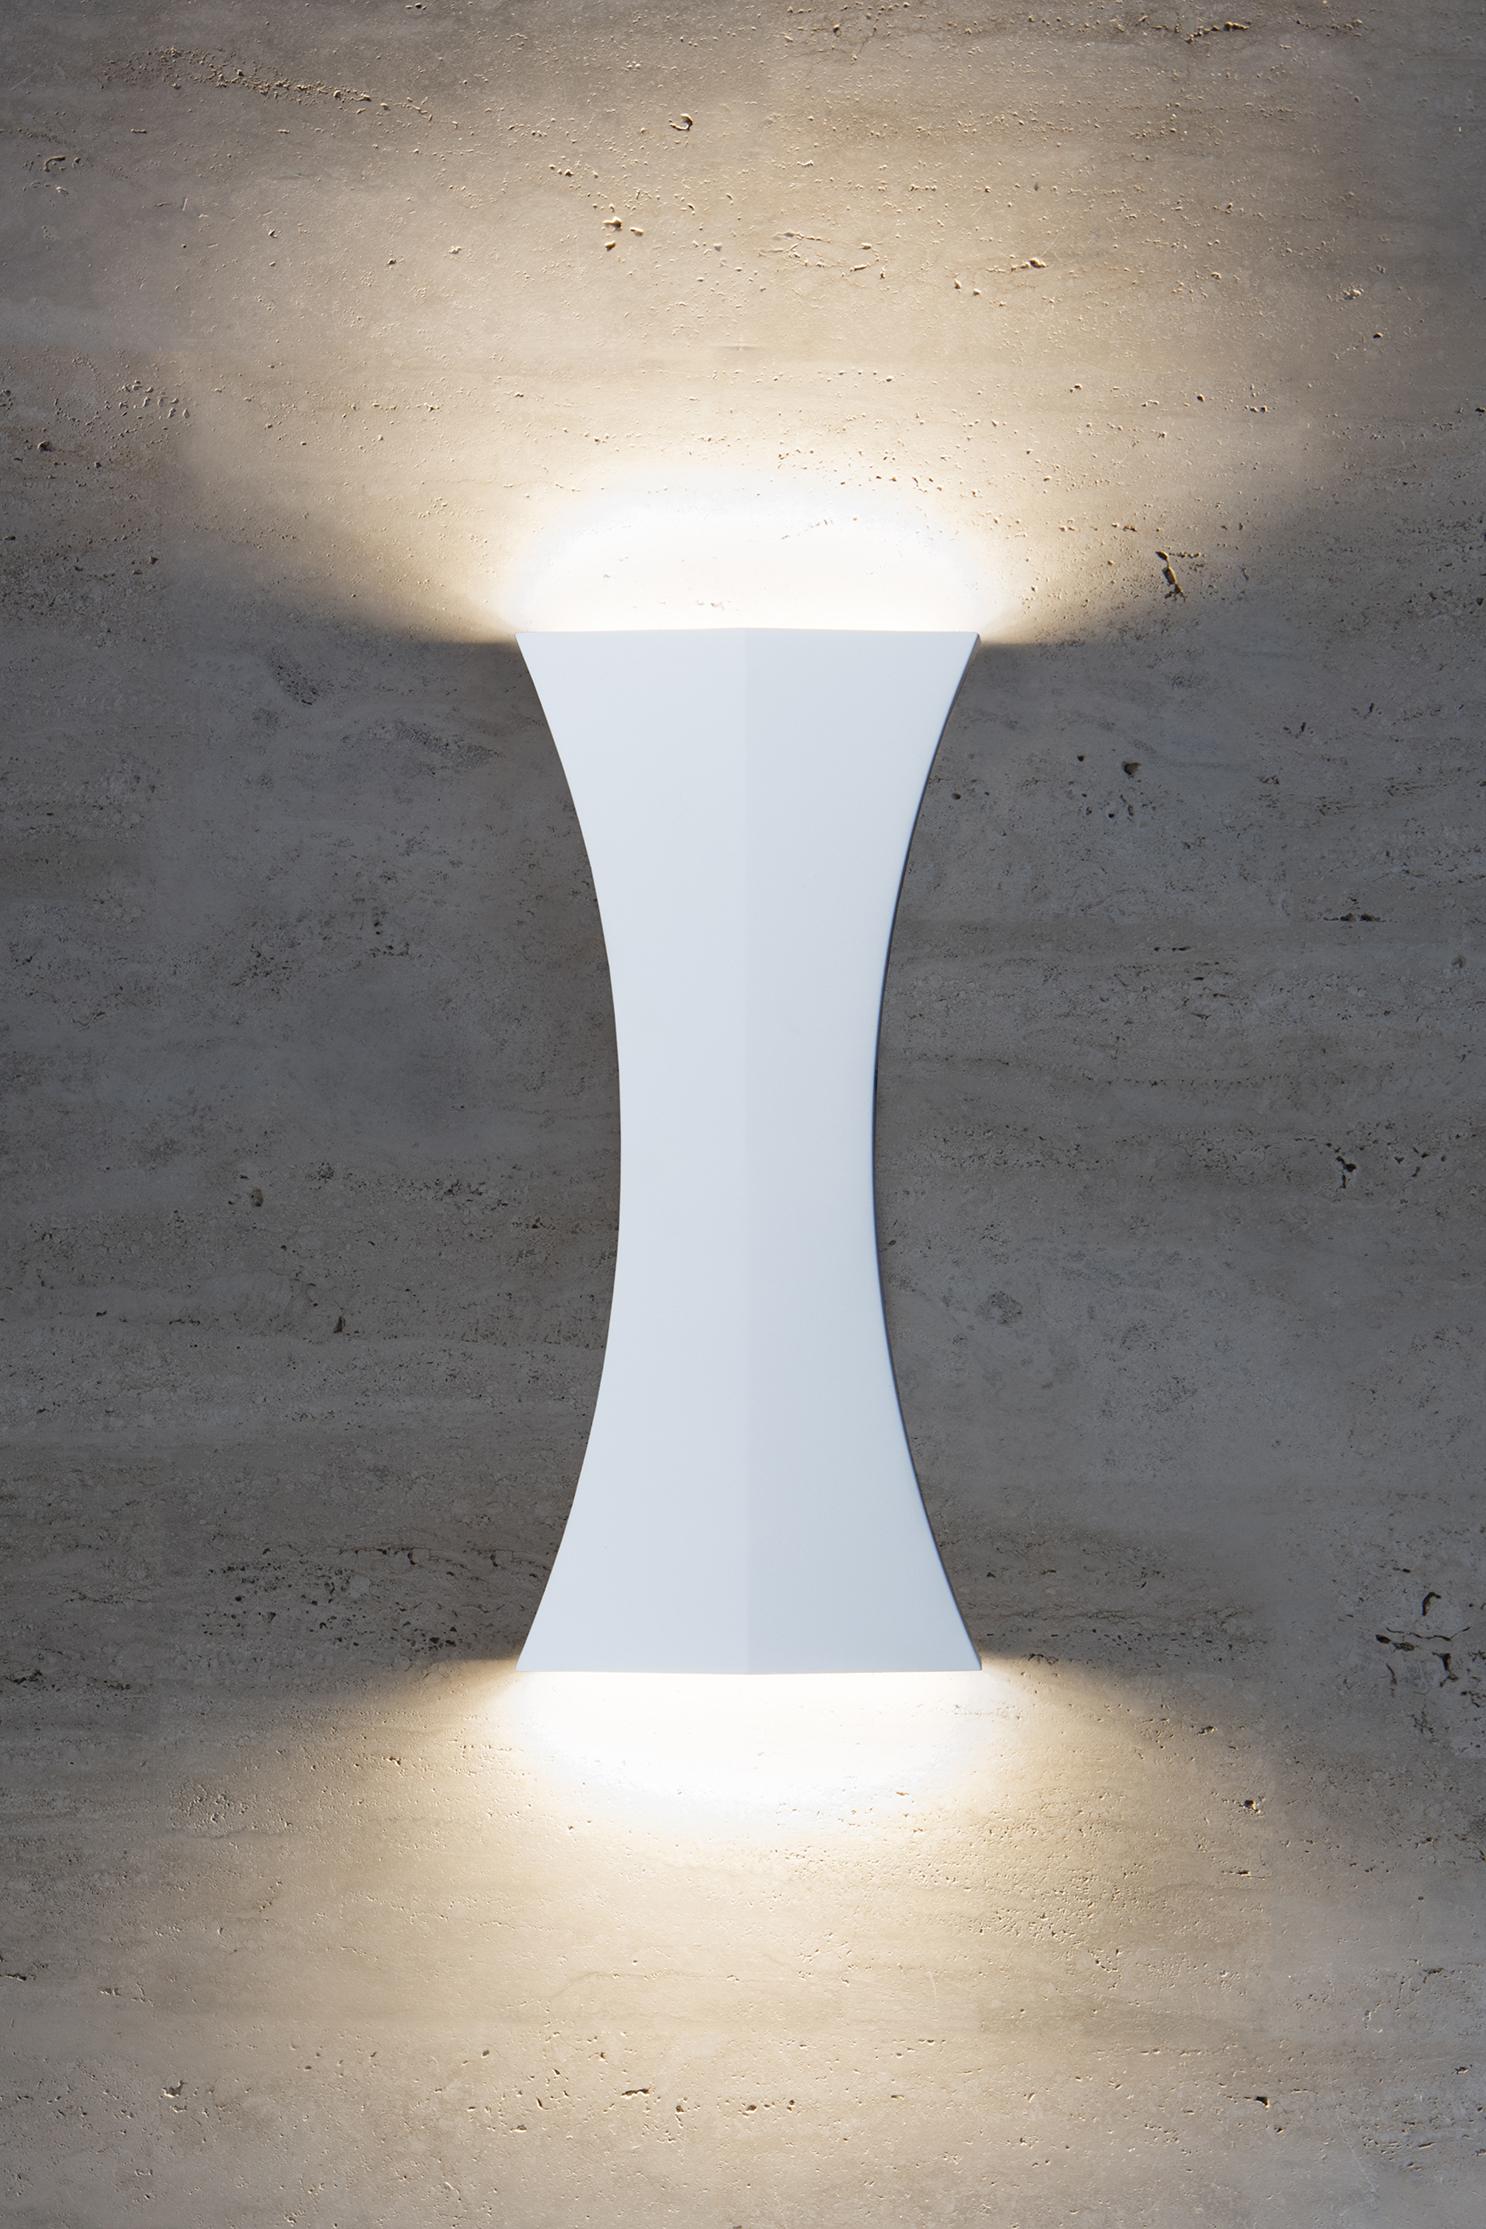 Tivoli, LLC is Bringing Lighting Products to Life at CinemaCon ...